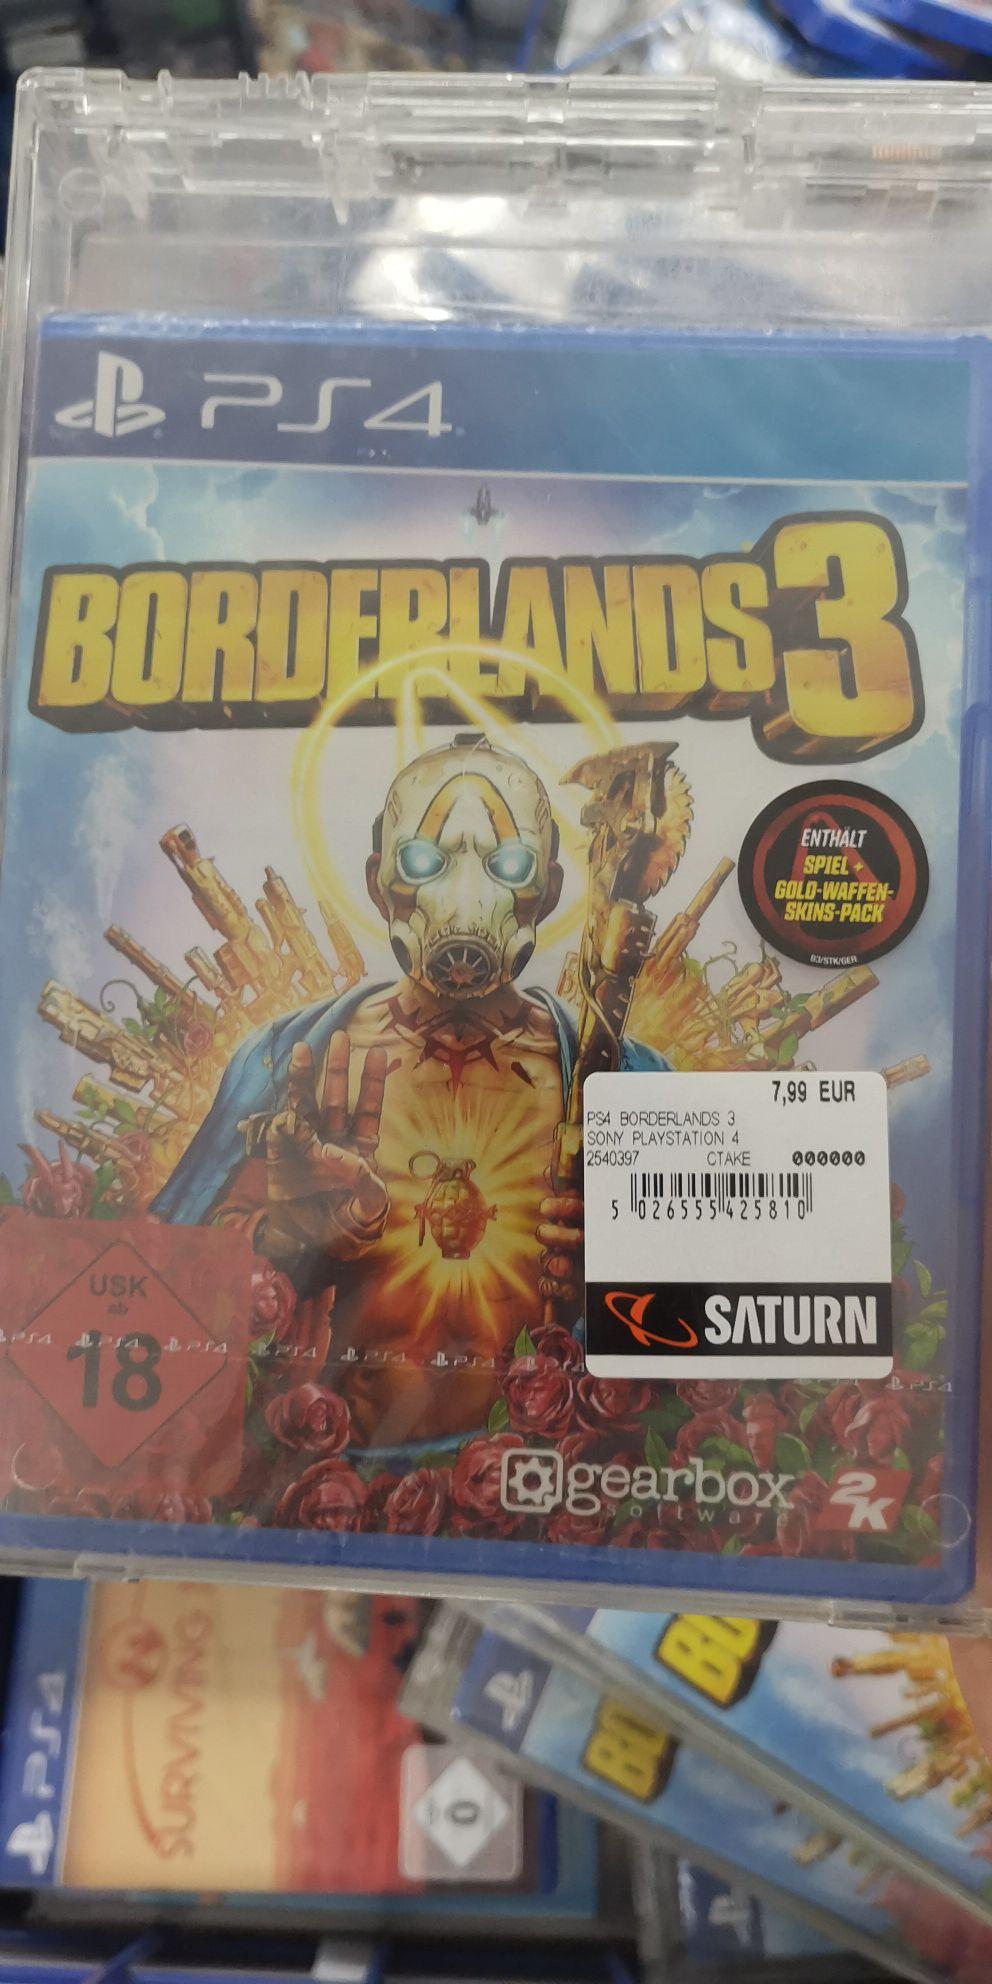 Lokal - Borderlands 3 PS4 für 7,99€ in Saturn Duisburg